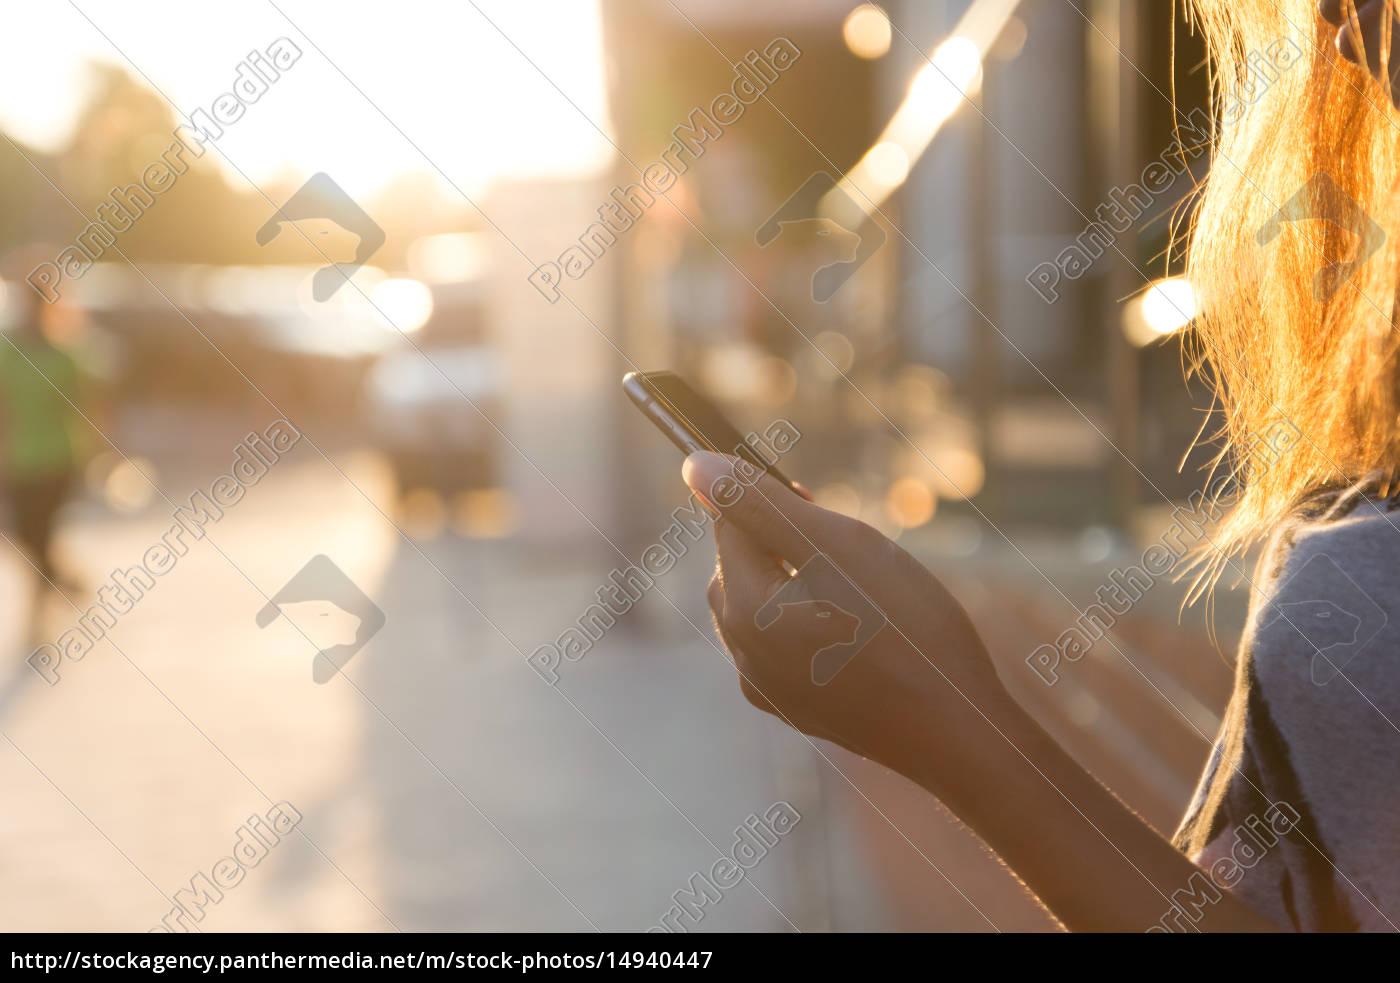 closeup, women, using, smartphone, at, sunset - 14940447